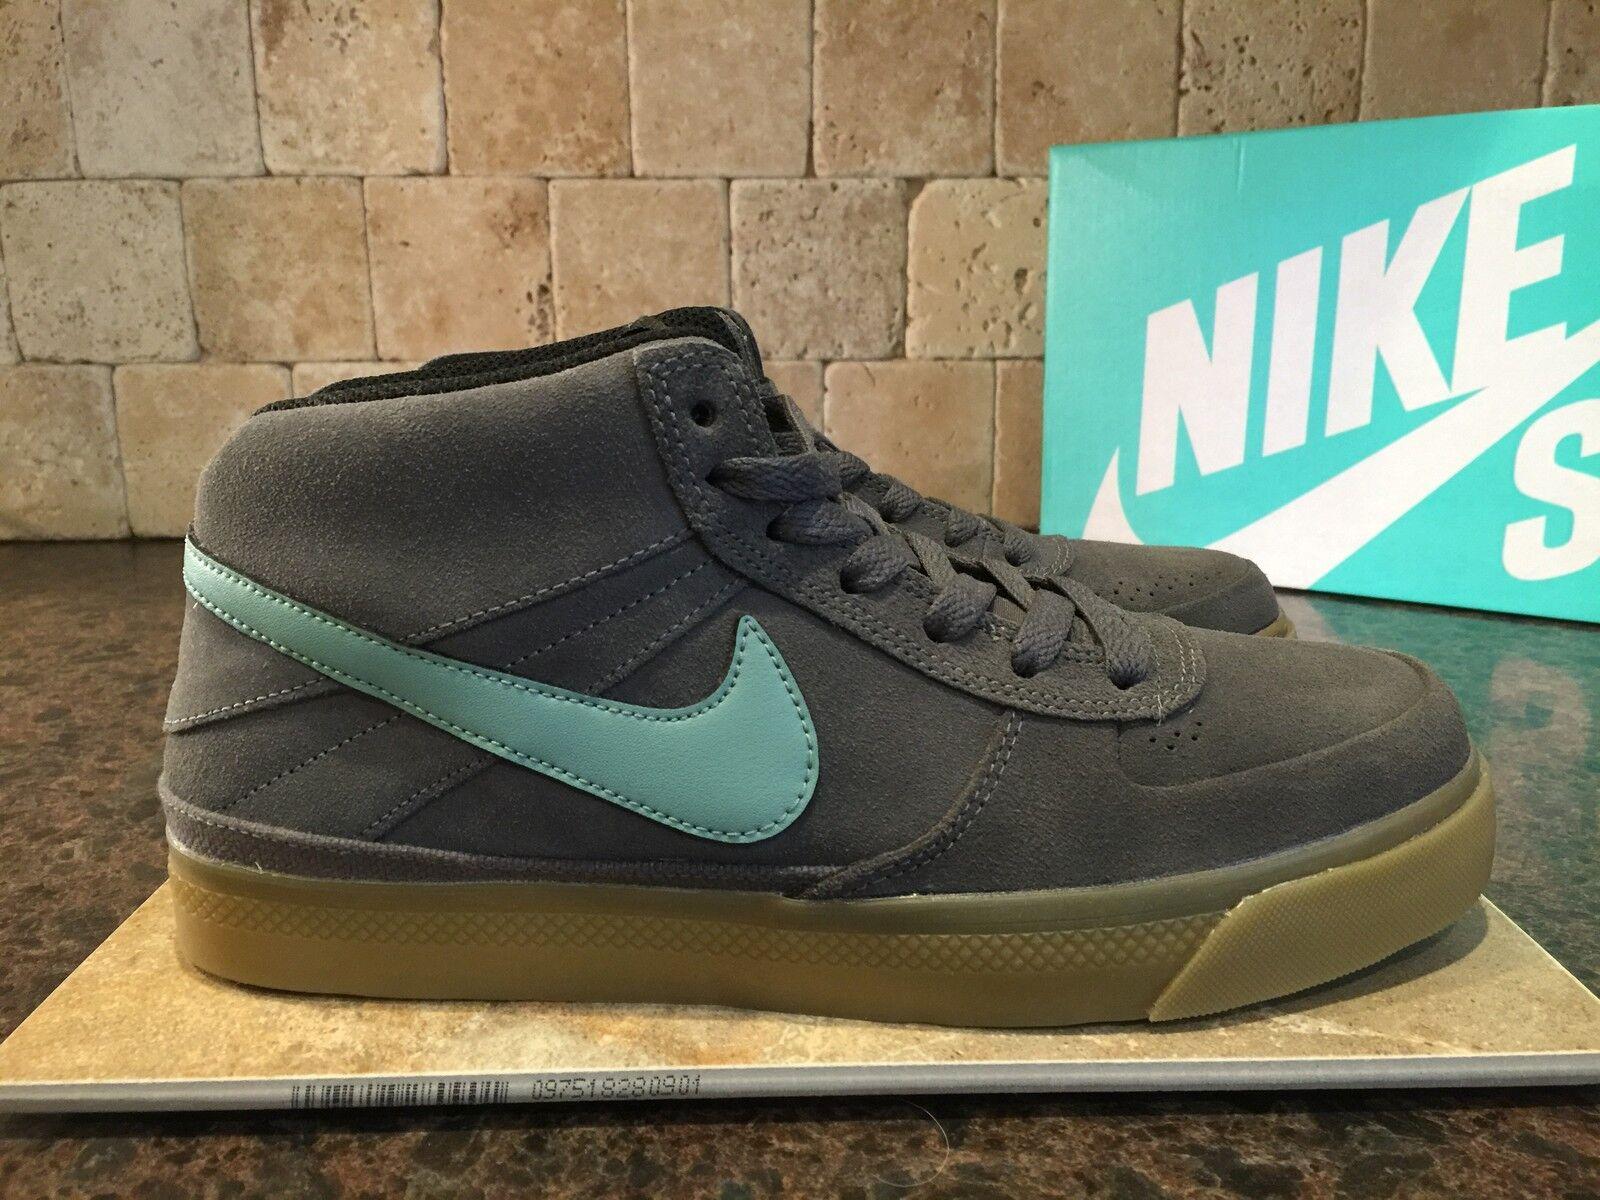 Nike sb mavrick metà ii scarpe uomini sz 8 386611 013 scamosciato 2014 pennino grey